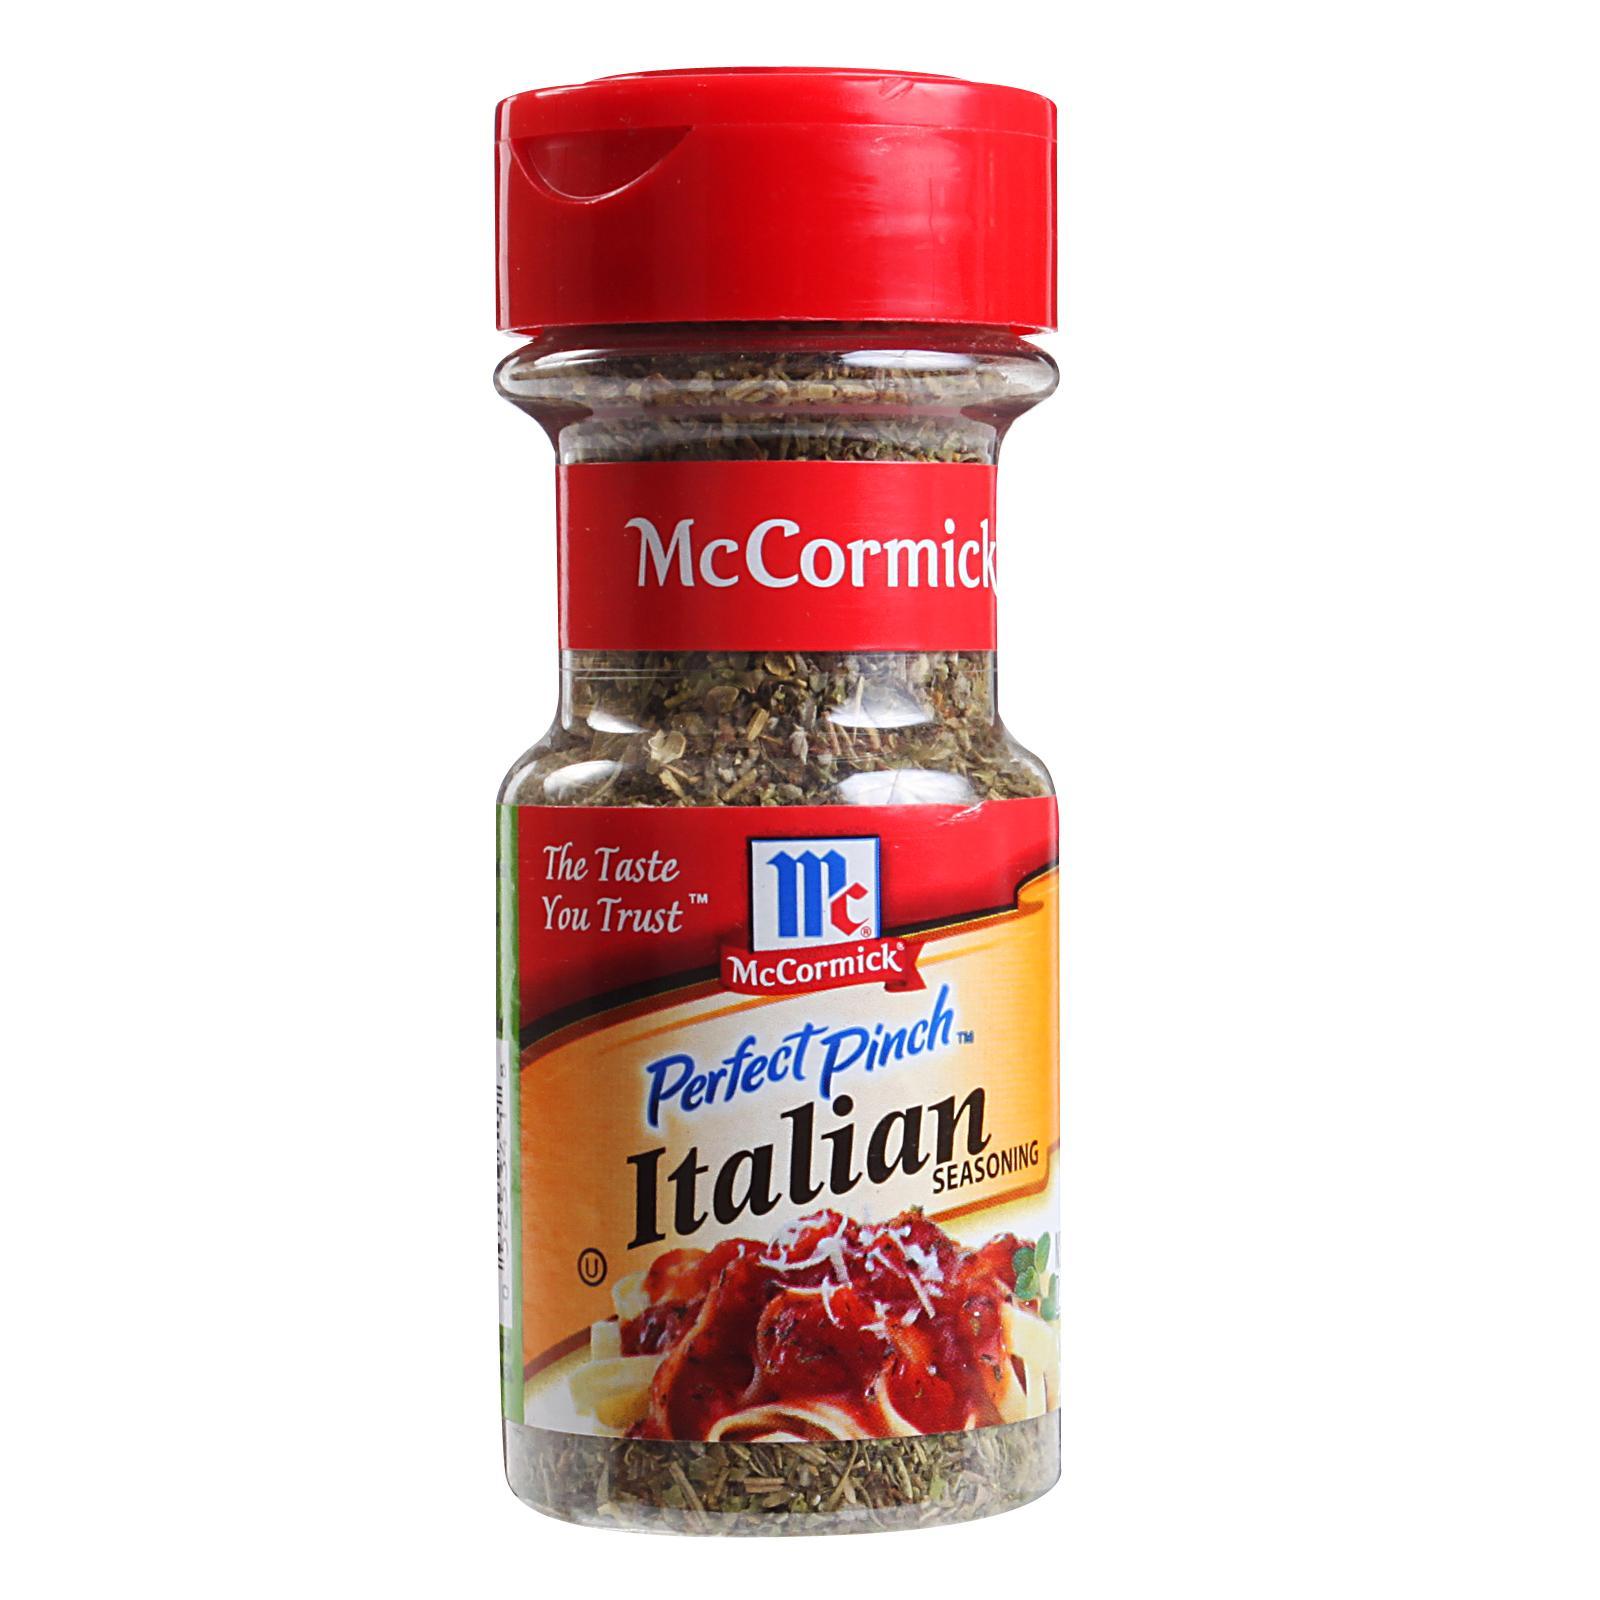 McCormick Perfect Pinch Italian Seasoning